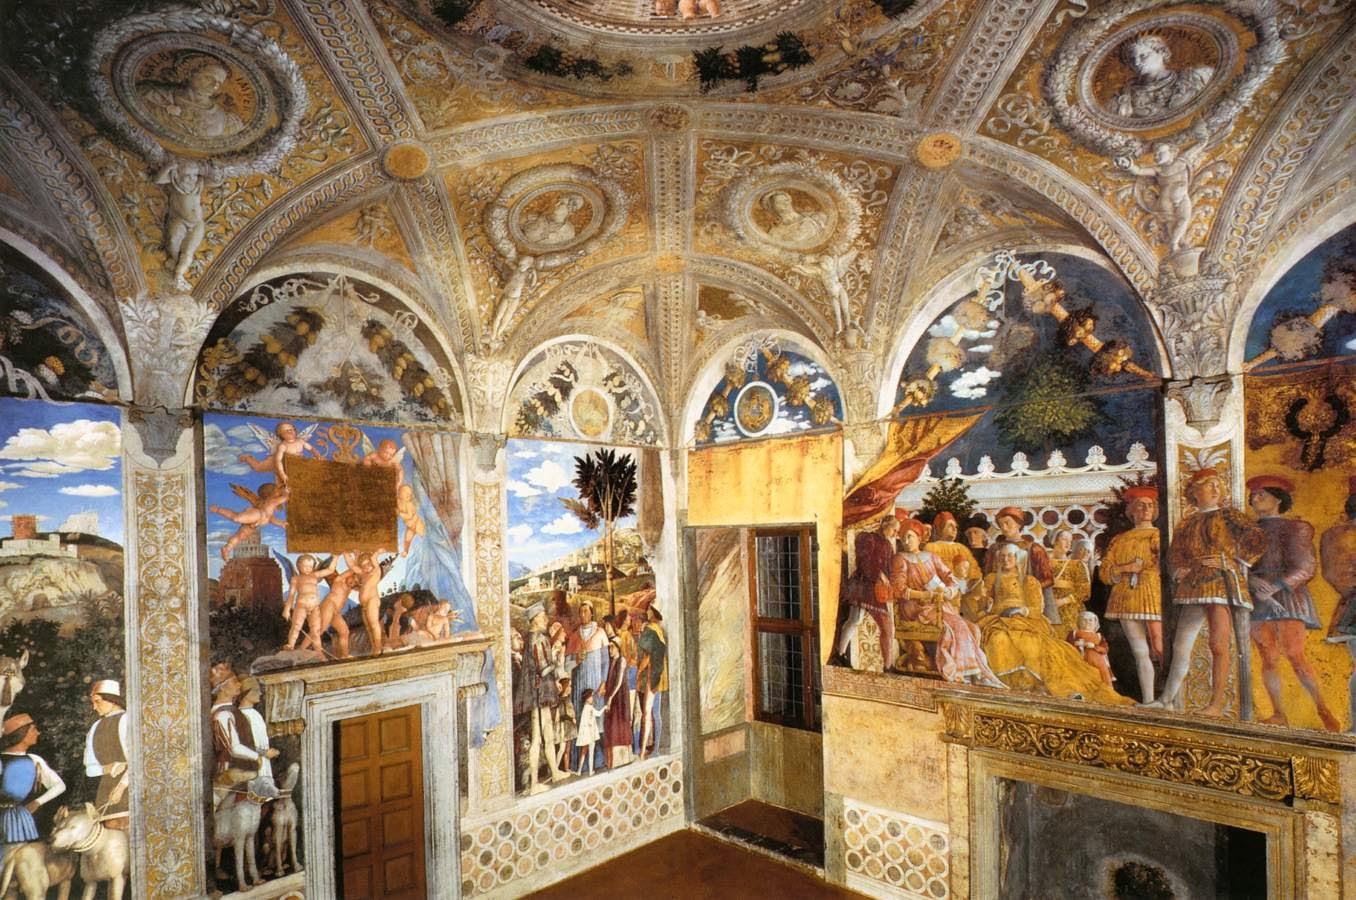 Freski Andrea Mantegna w pałacu książąt Mantui